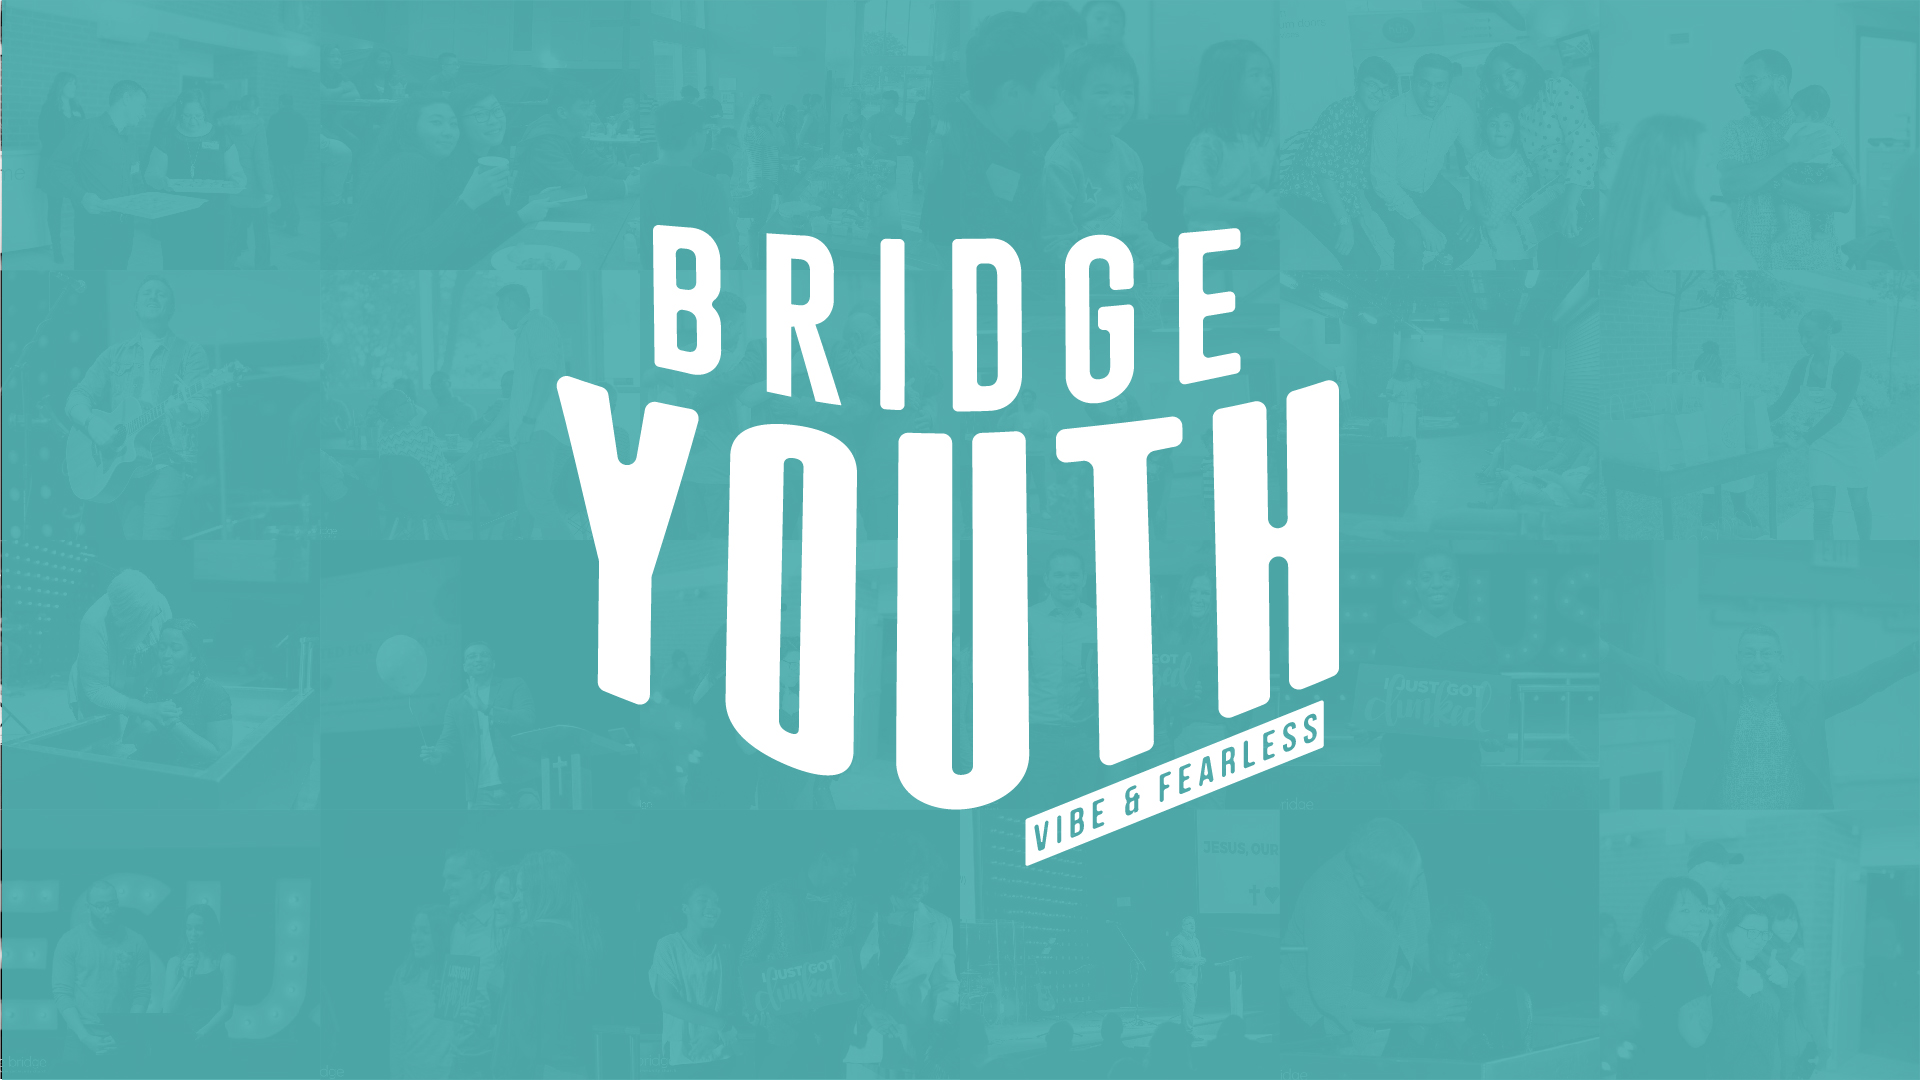 Bridge Youth 169_banner-03-01